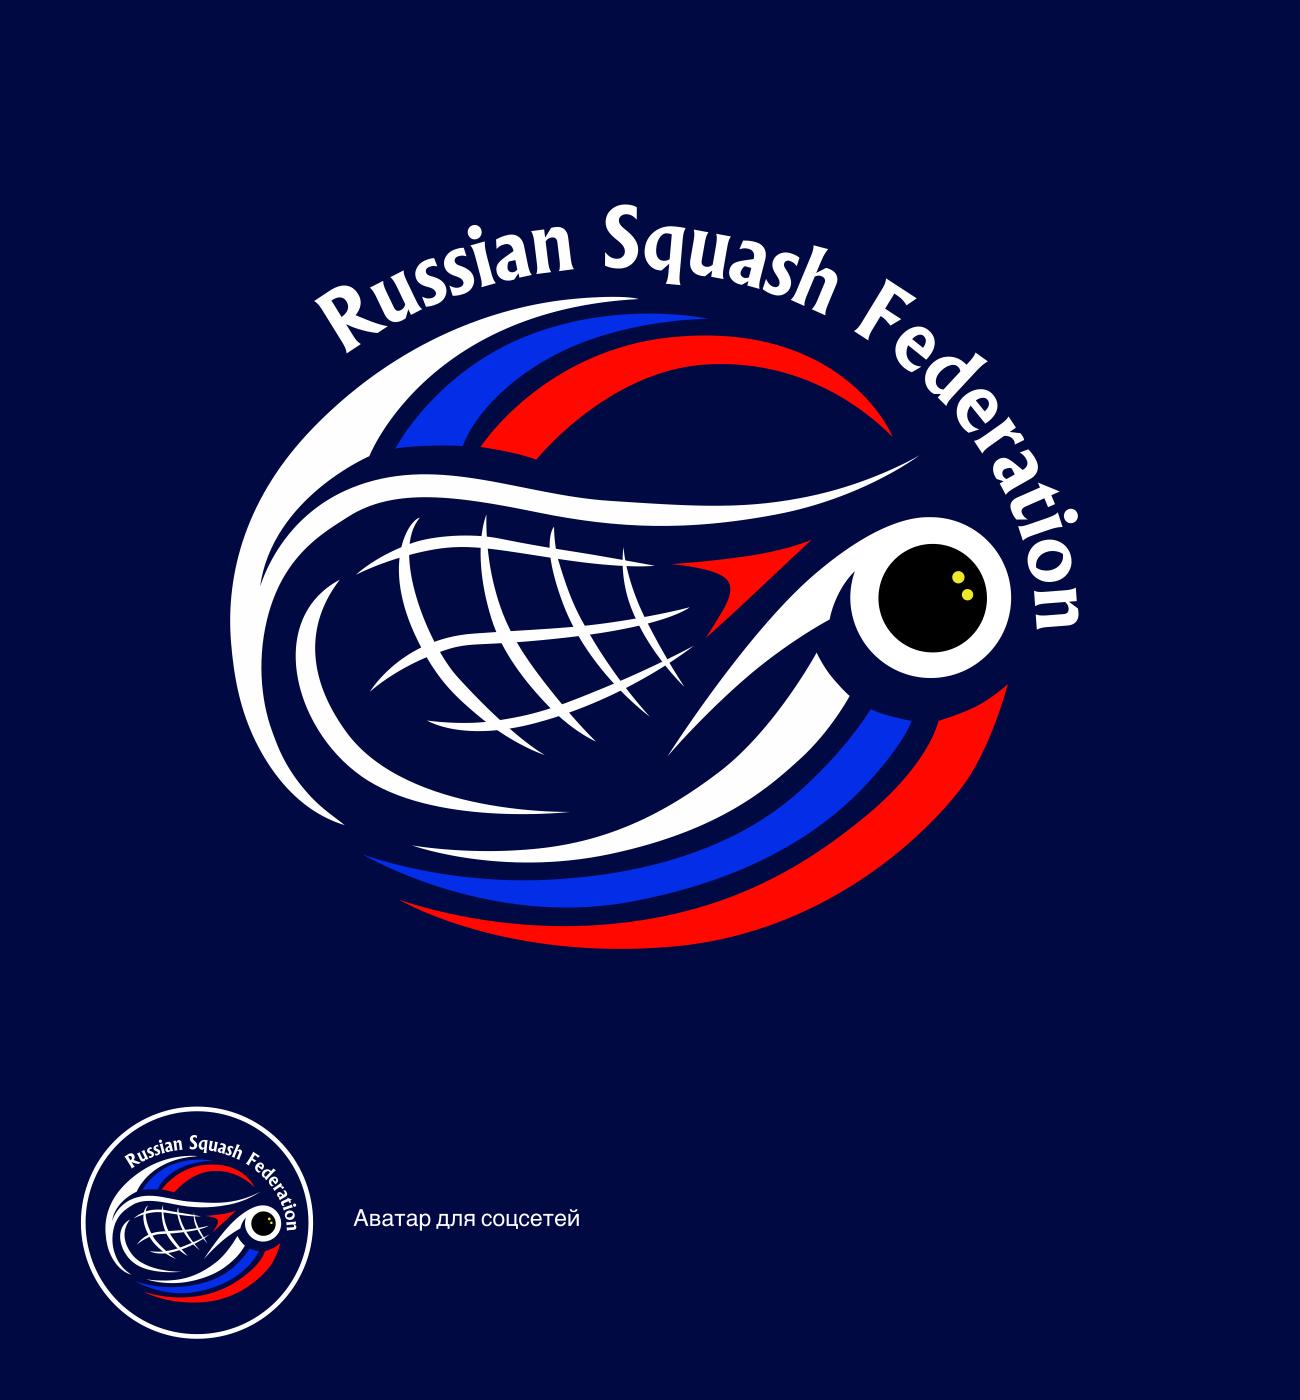 Разработать логотип для Федерации сквоша России фото f_0865f399c9b2870a.png